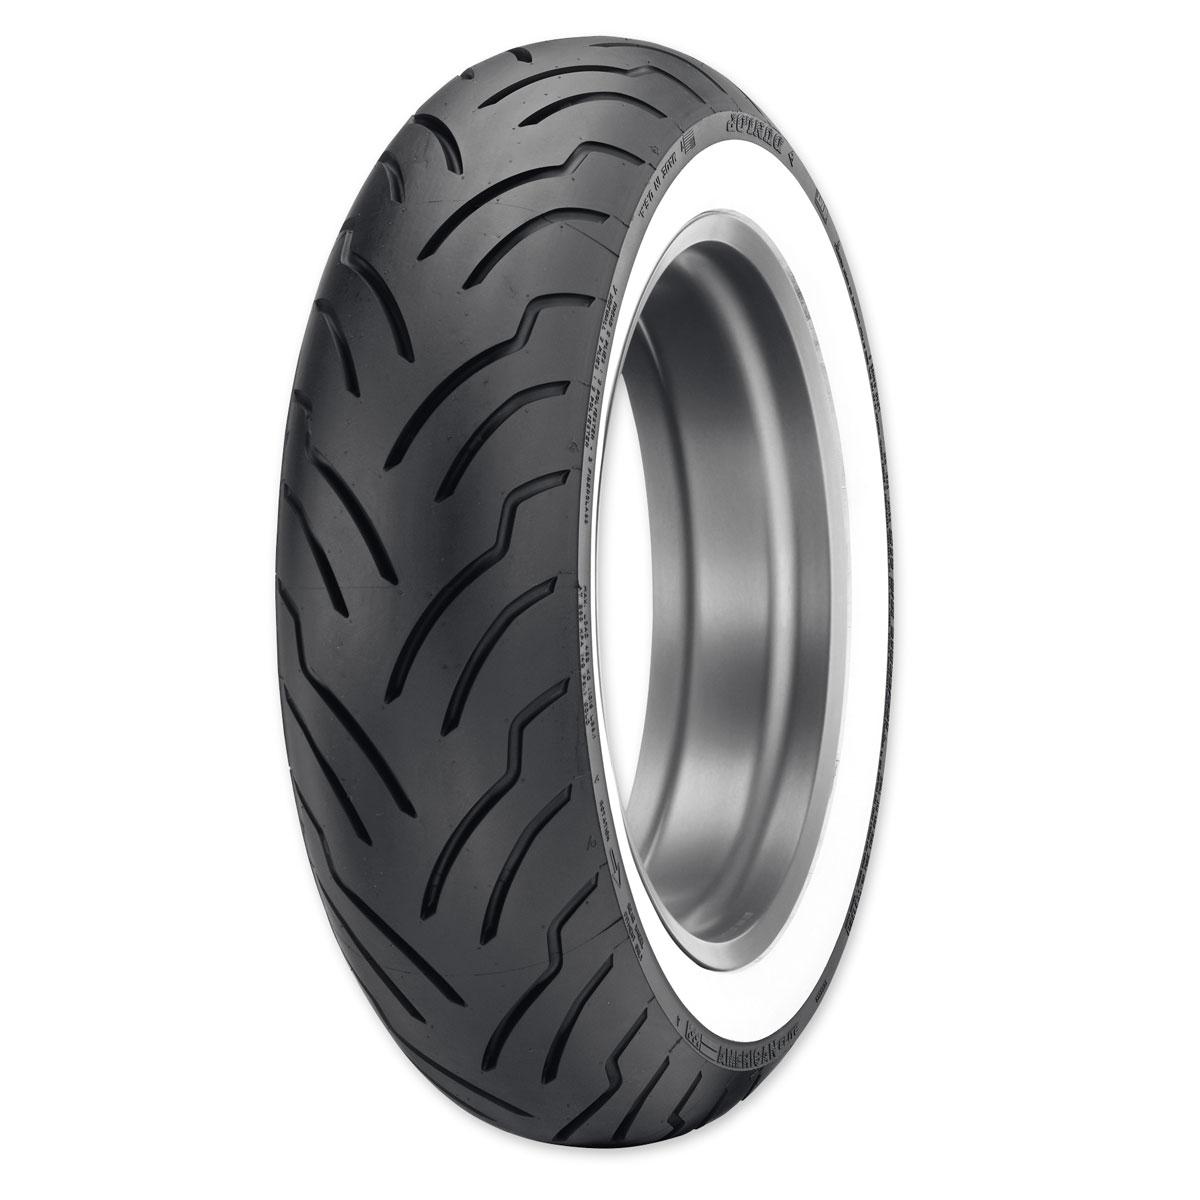 Dunlop American Elite MU85B16 77H Wide Whitewall Rear Tire